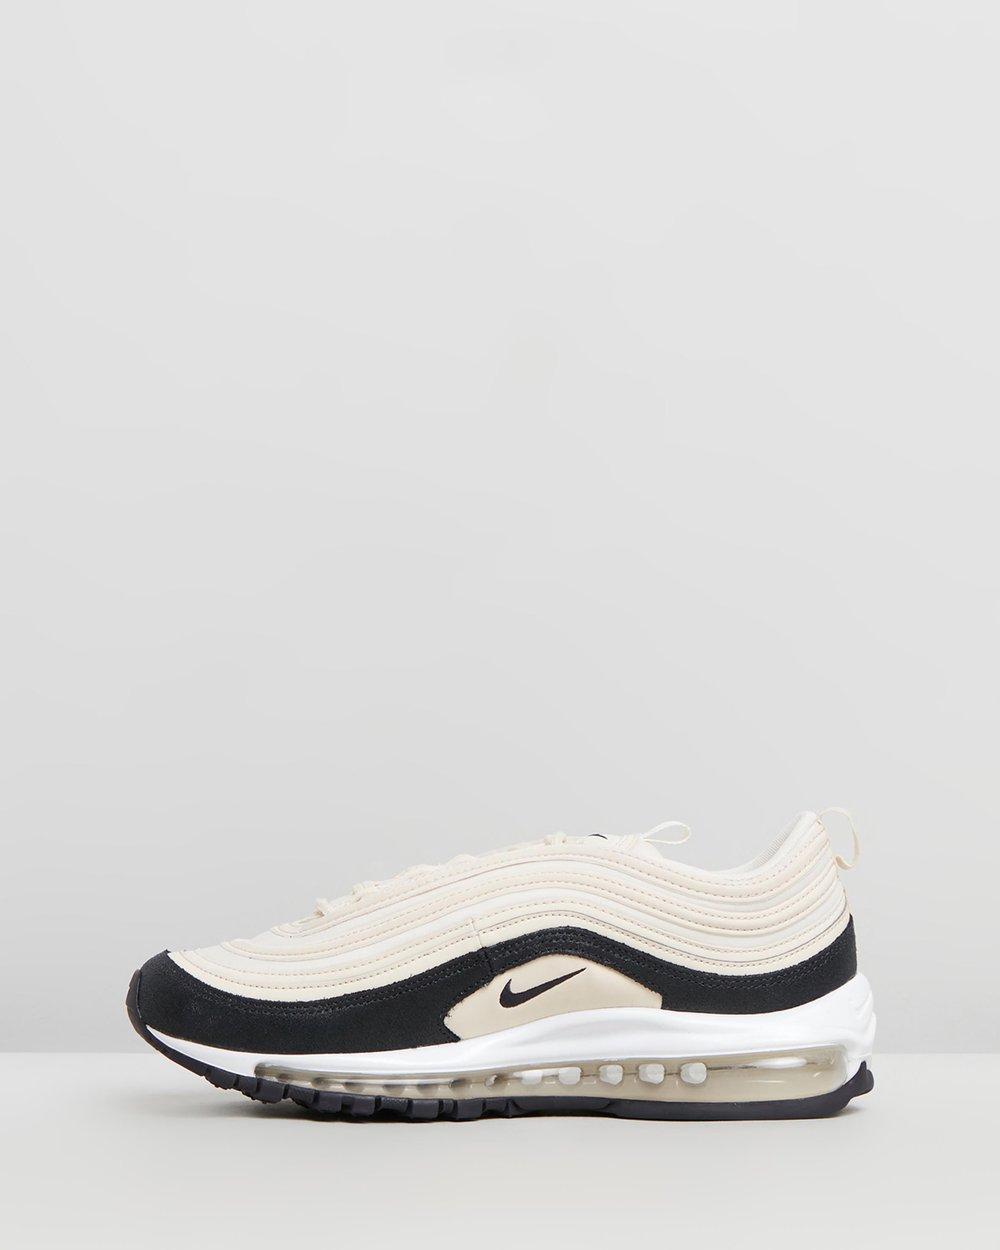 95a6444d3389e Air Max '97 Premium - Women's by Nike Online | THE ICONIC | Australia